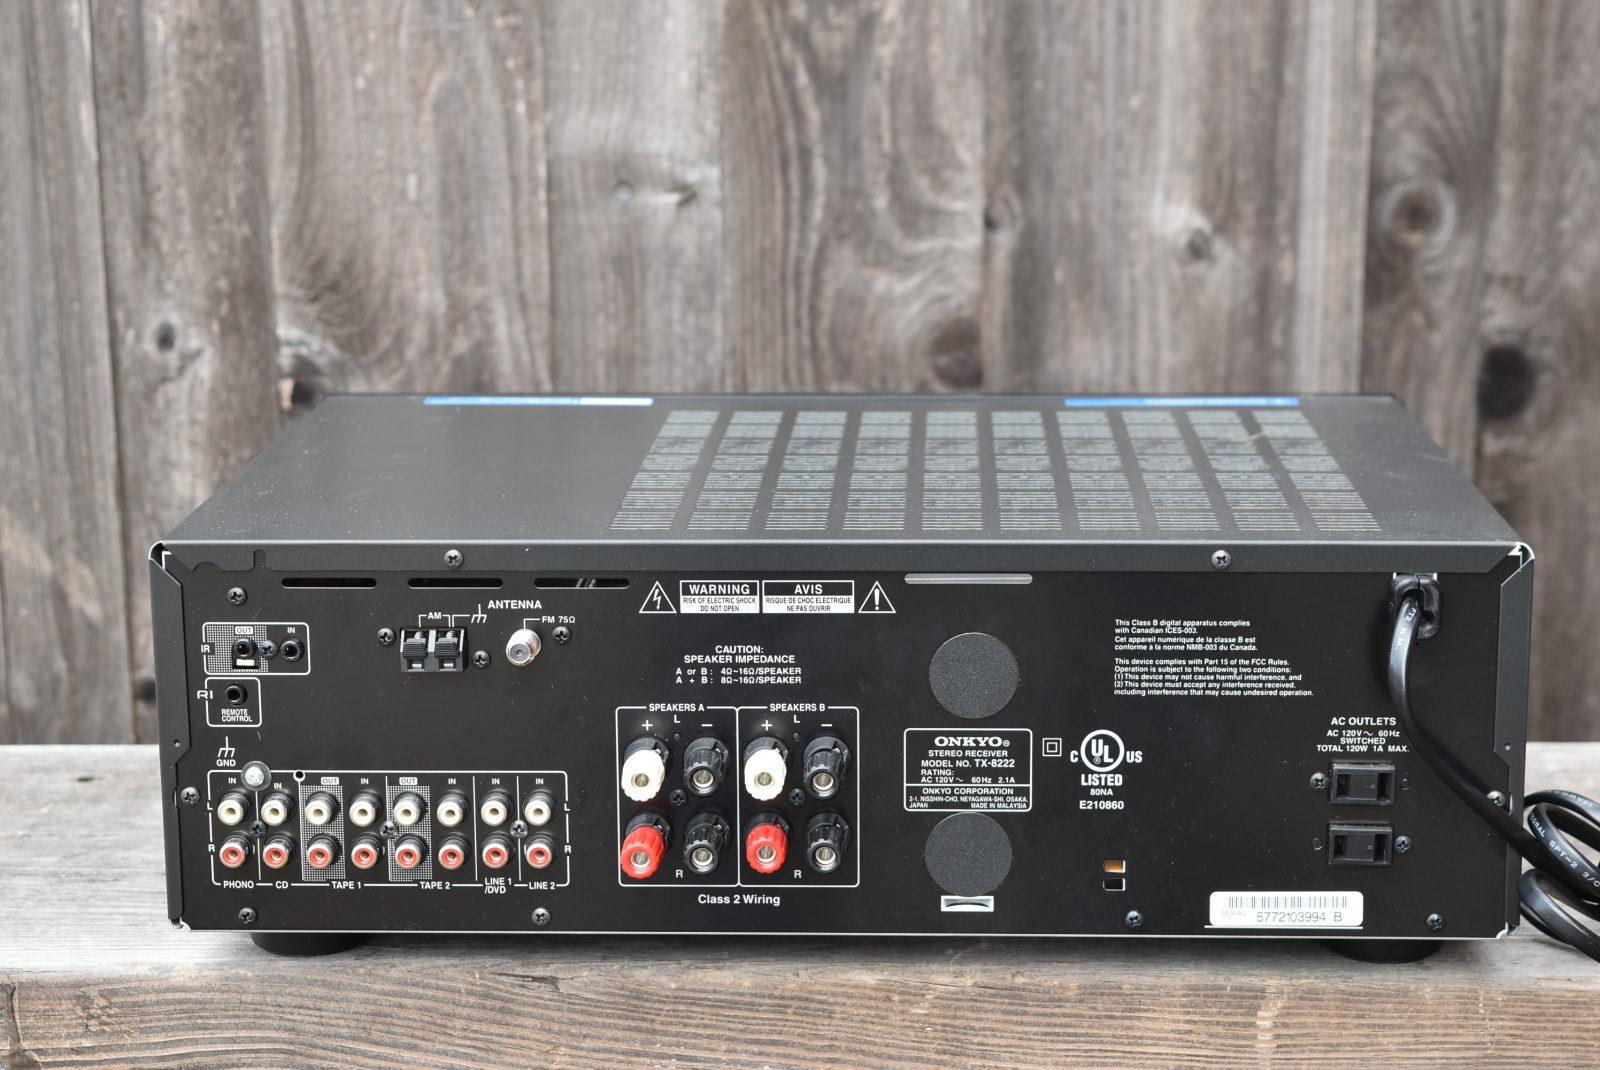 Onkyo Receiver - Model: TX-8222